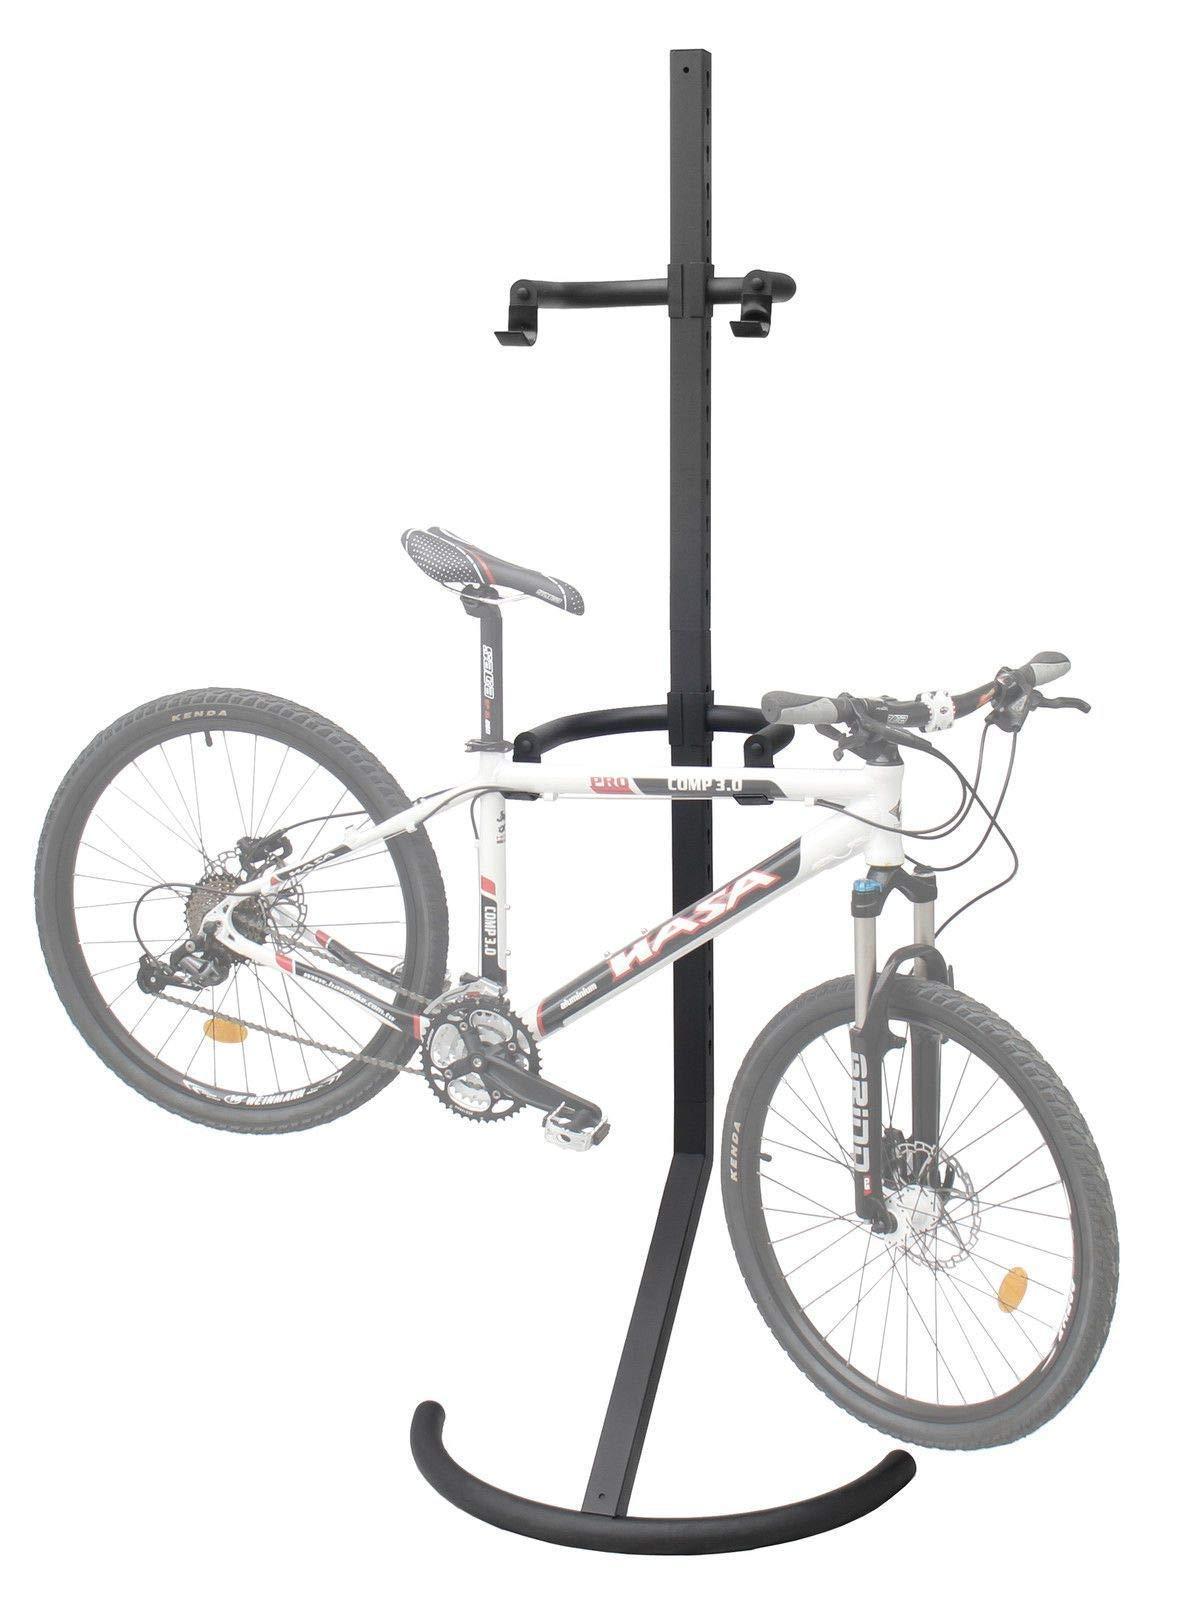 CyclingDeal 2 Bike Bicycle Storage Floor Garage Parking Rack Stand leans Against Wall